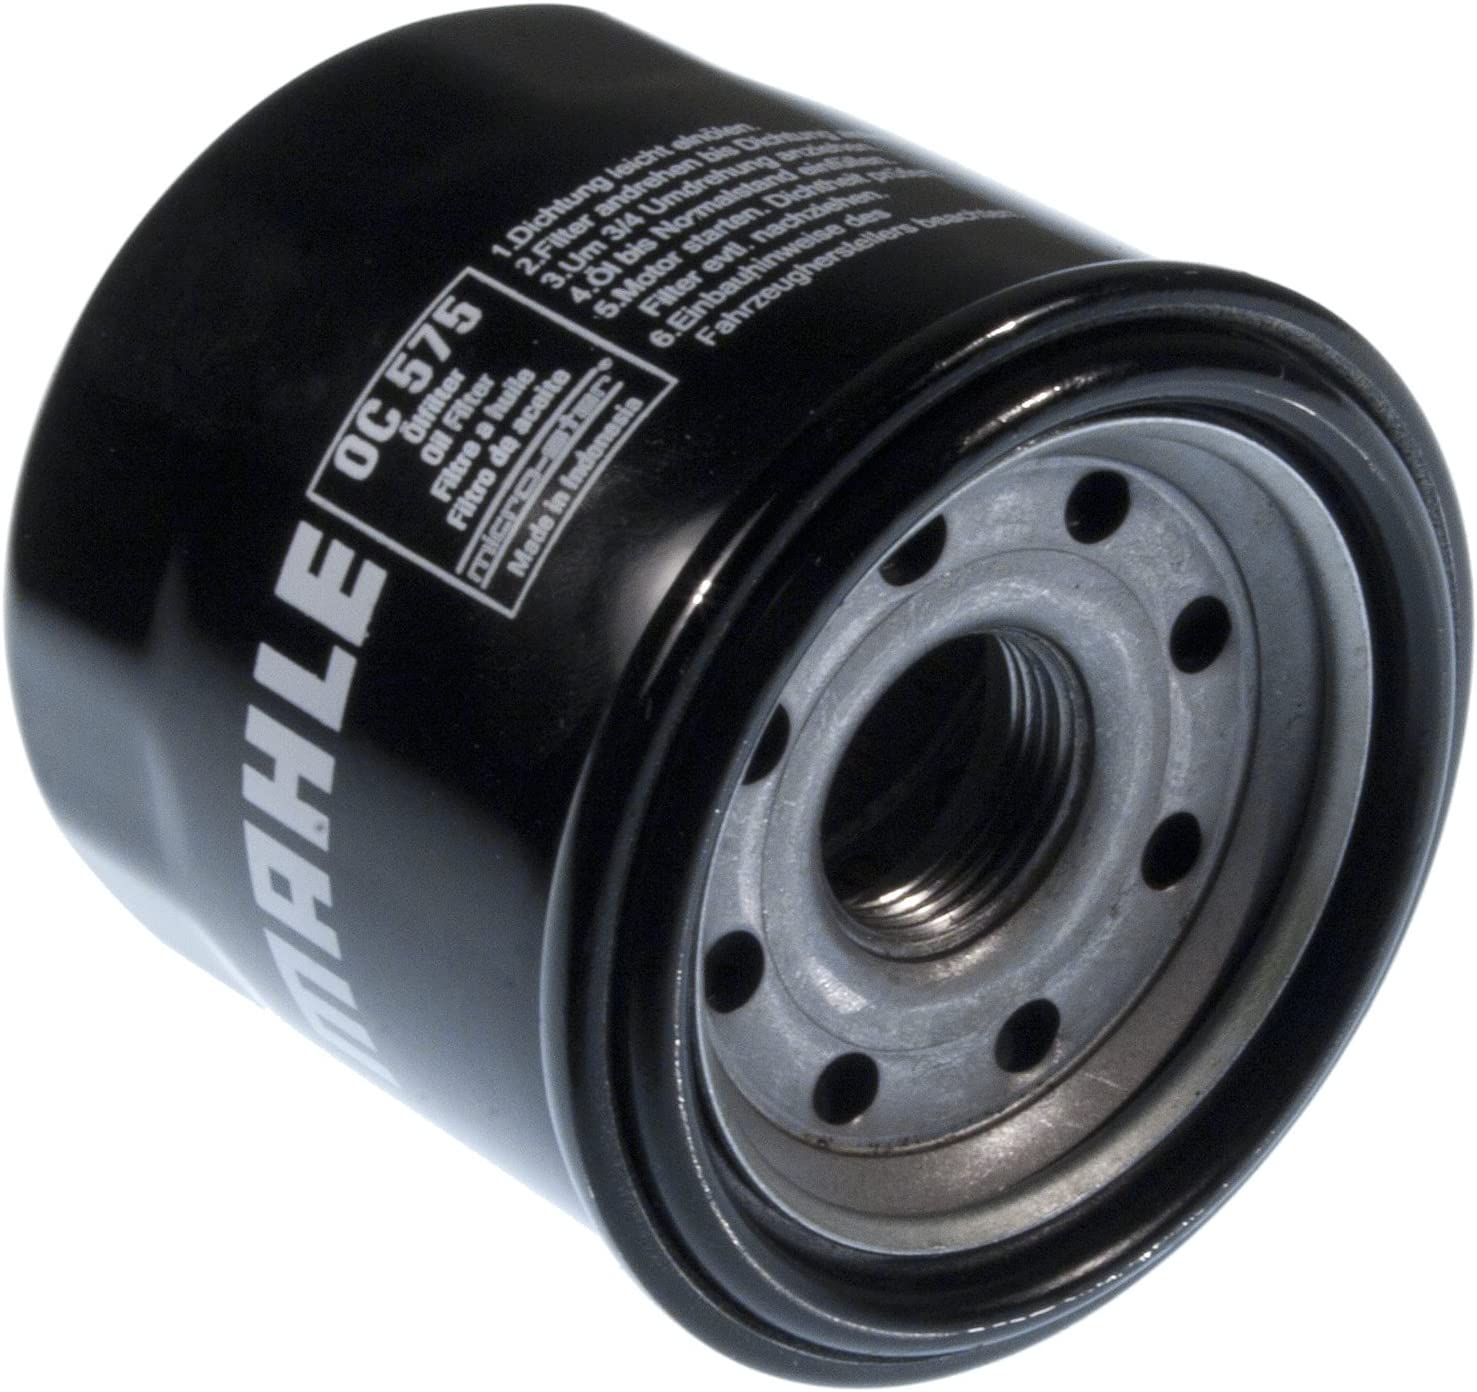 MeterMall Auto Universal 13cm//17cm Length Manual Car Gear Shift Knob Aluminium Alloy Racing Mugen Shift Knob Purple 170mm